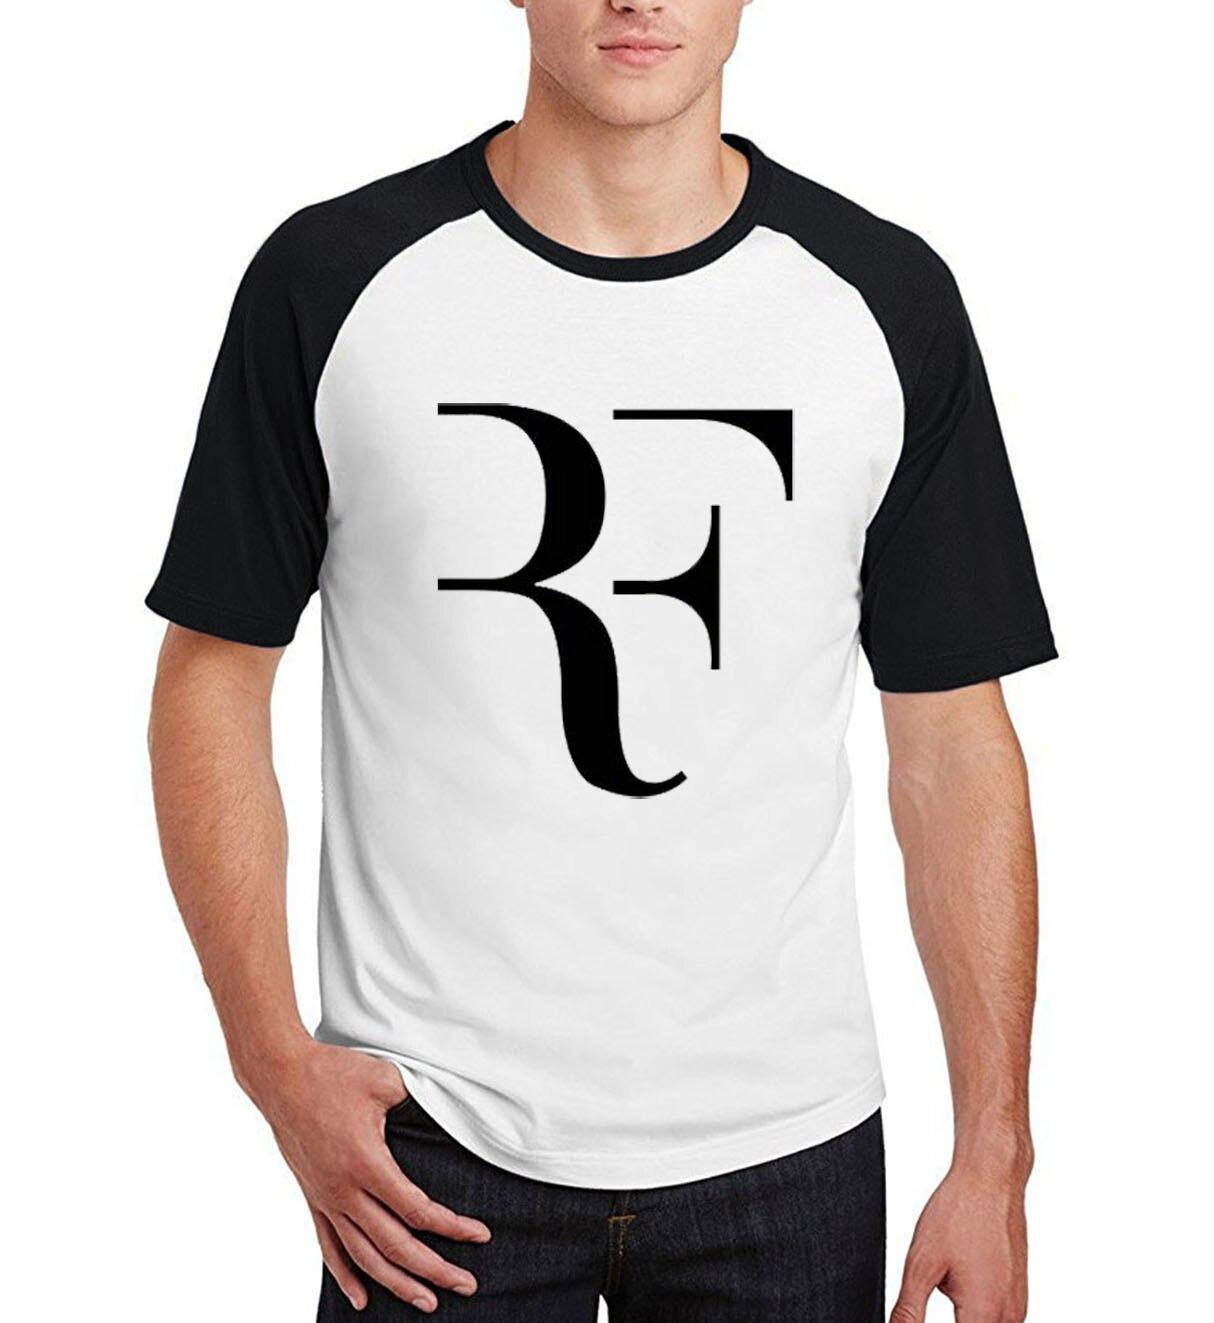 Men summer  t-shirts 2019 new fitness hip-hop raglan Short Sleeve Tee Shirt homme fashion casual cotton camisetas